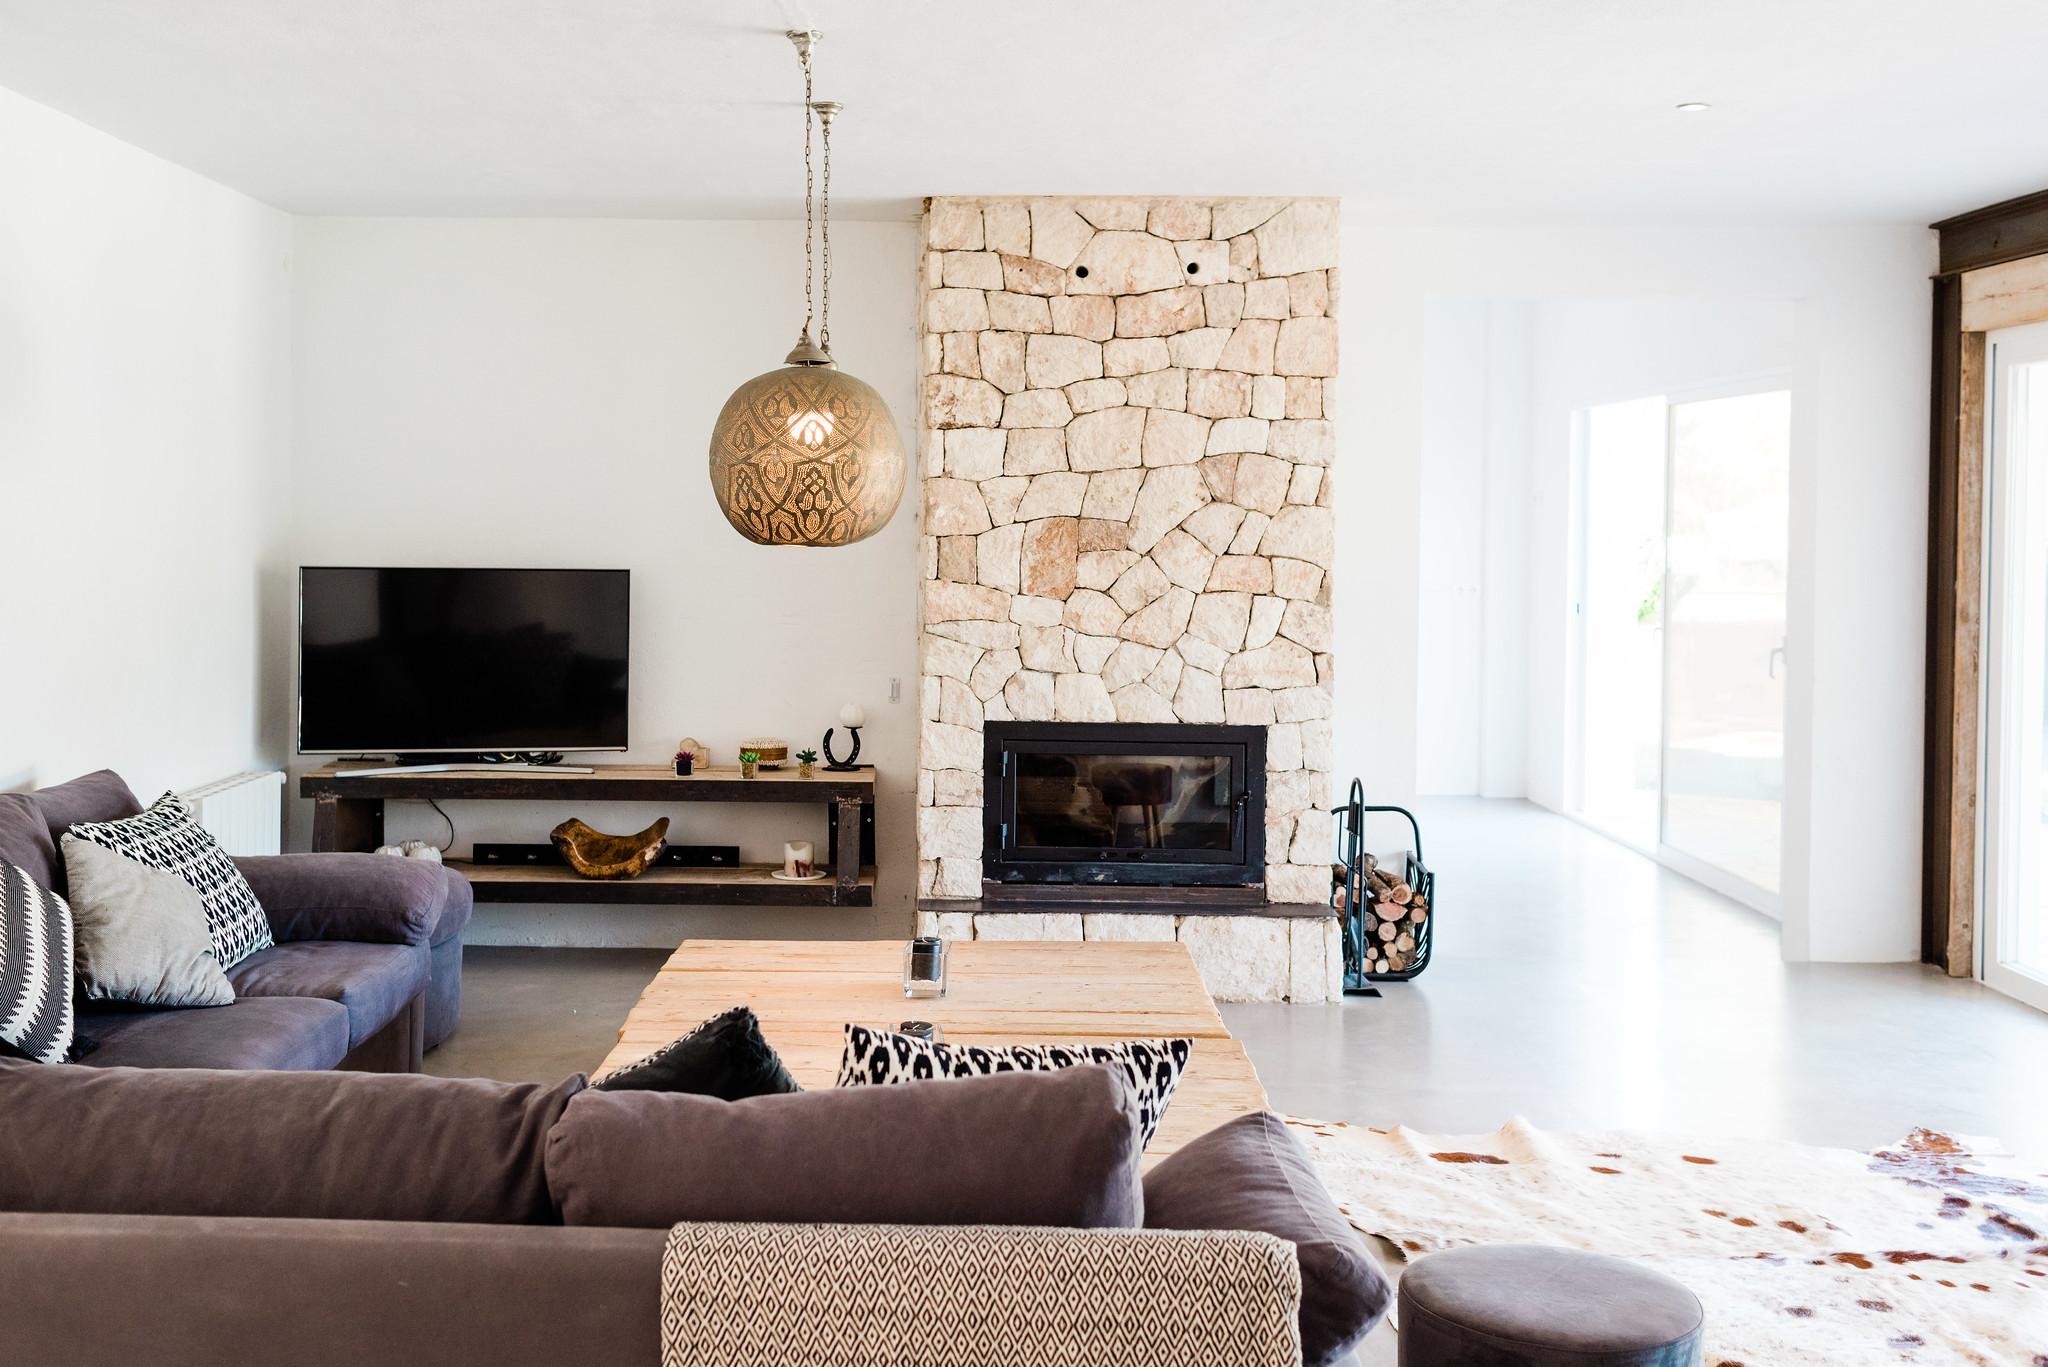 https://www.white-ibiza.com/wp-content/uploads/2020/05/white-ibiza-villas-can-verde-interior-living-room2.jpg